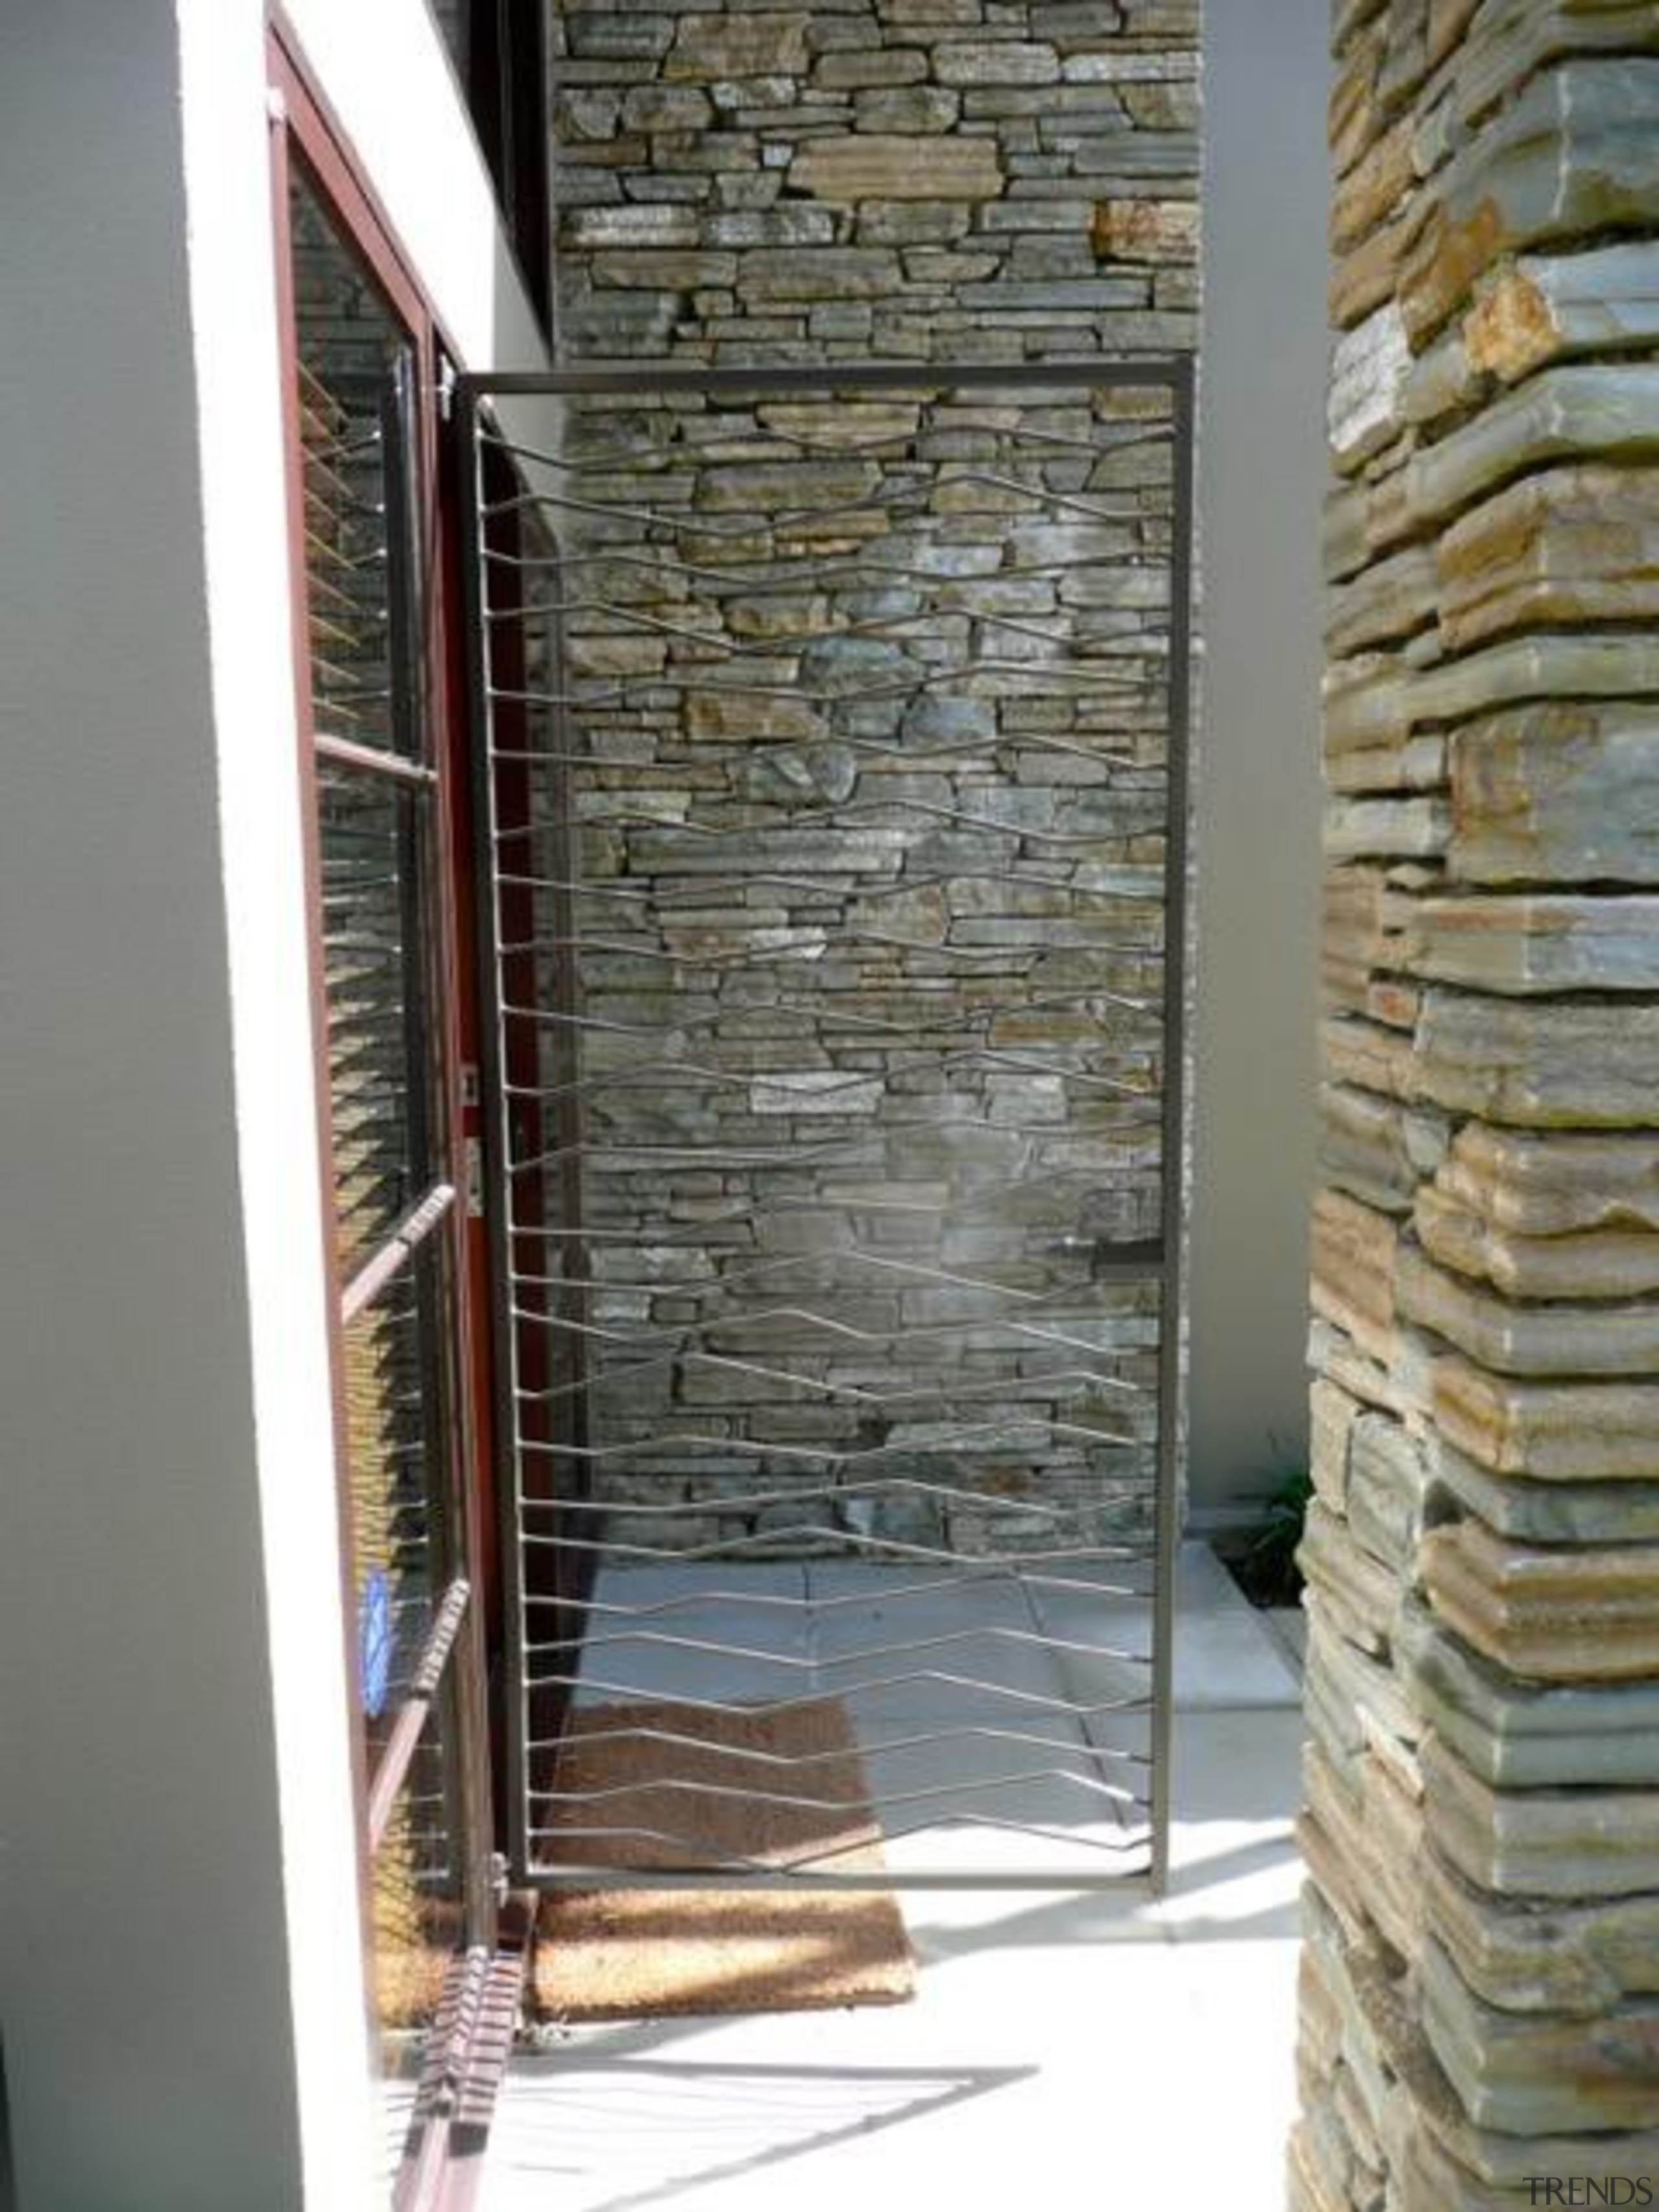 p1140743.jpeg - p1140743.jpeg - wall | window | wall, window, gray